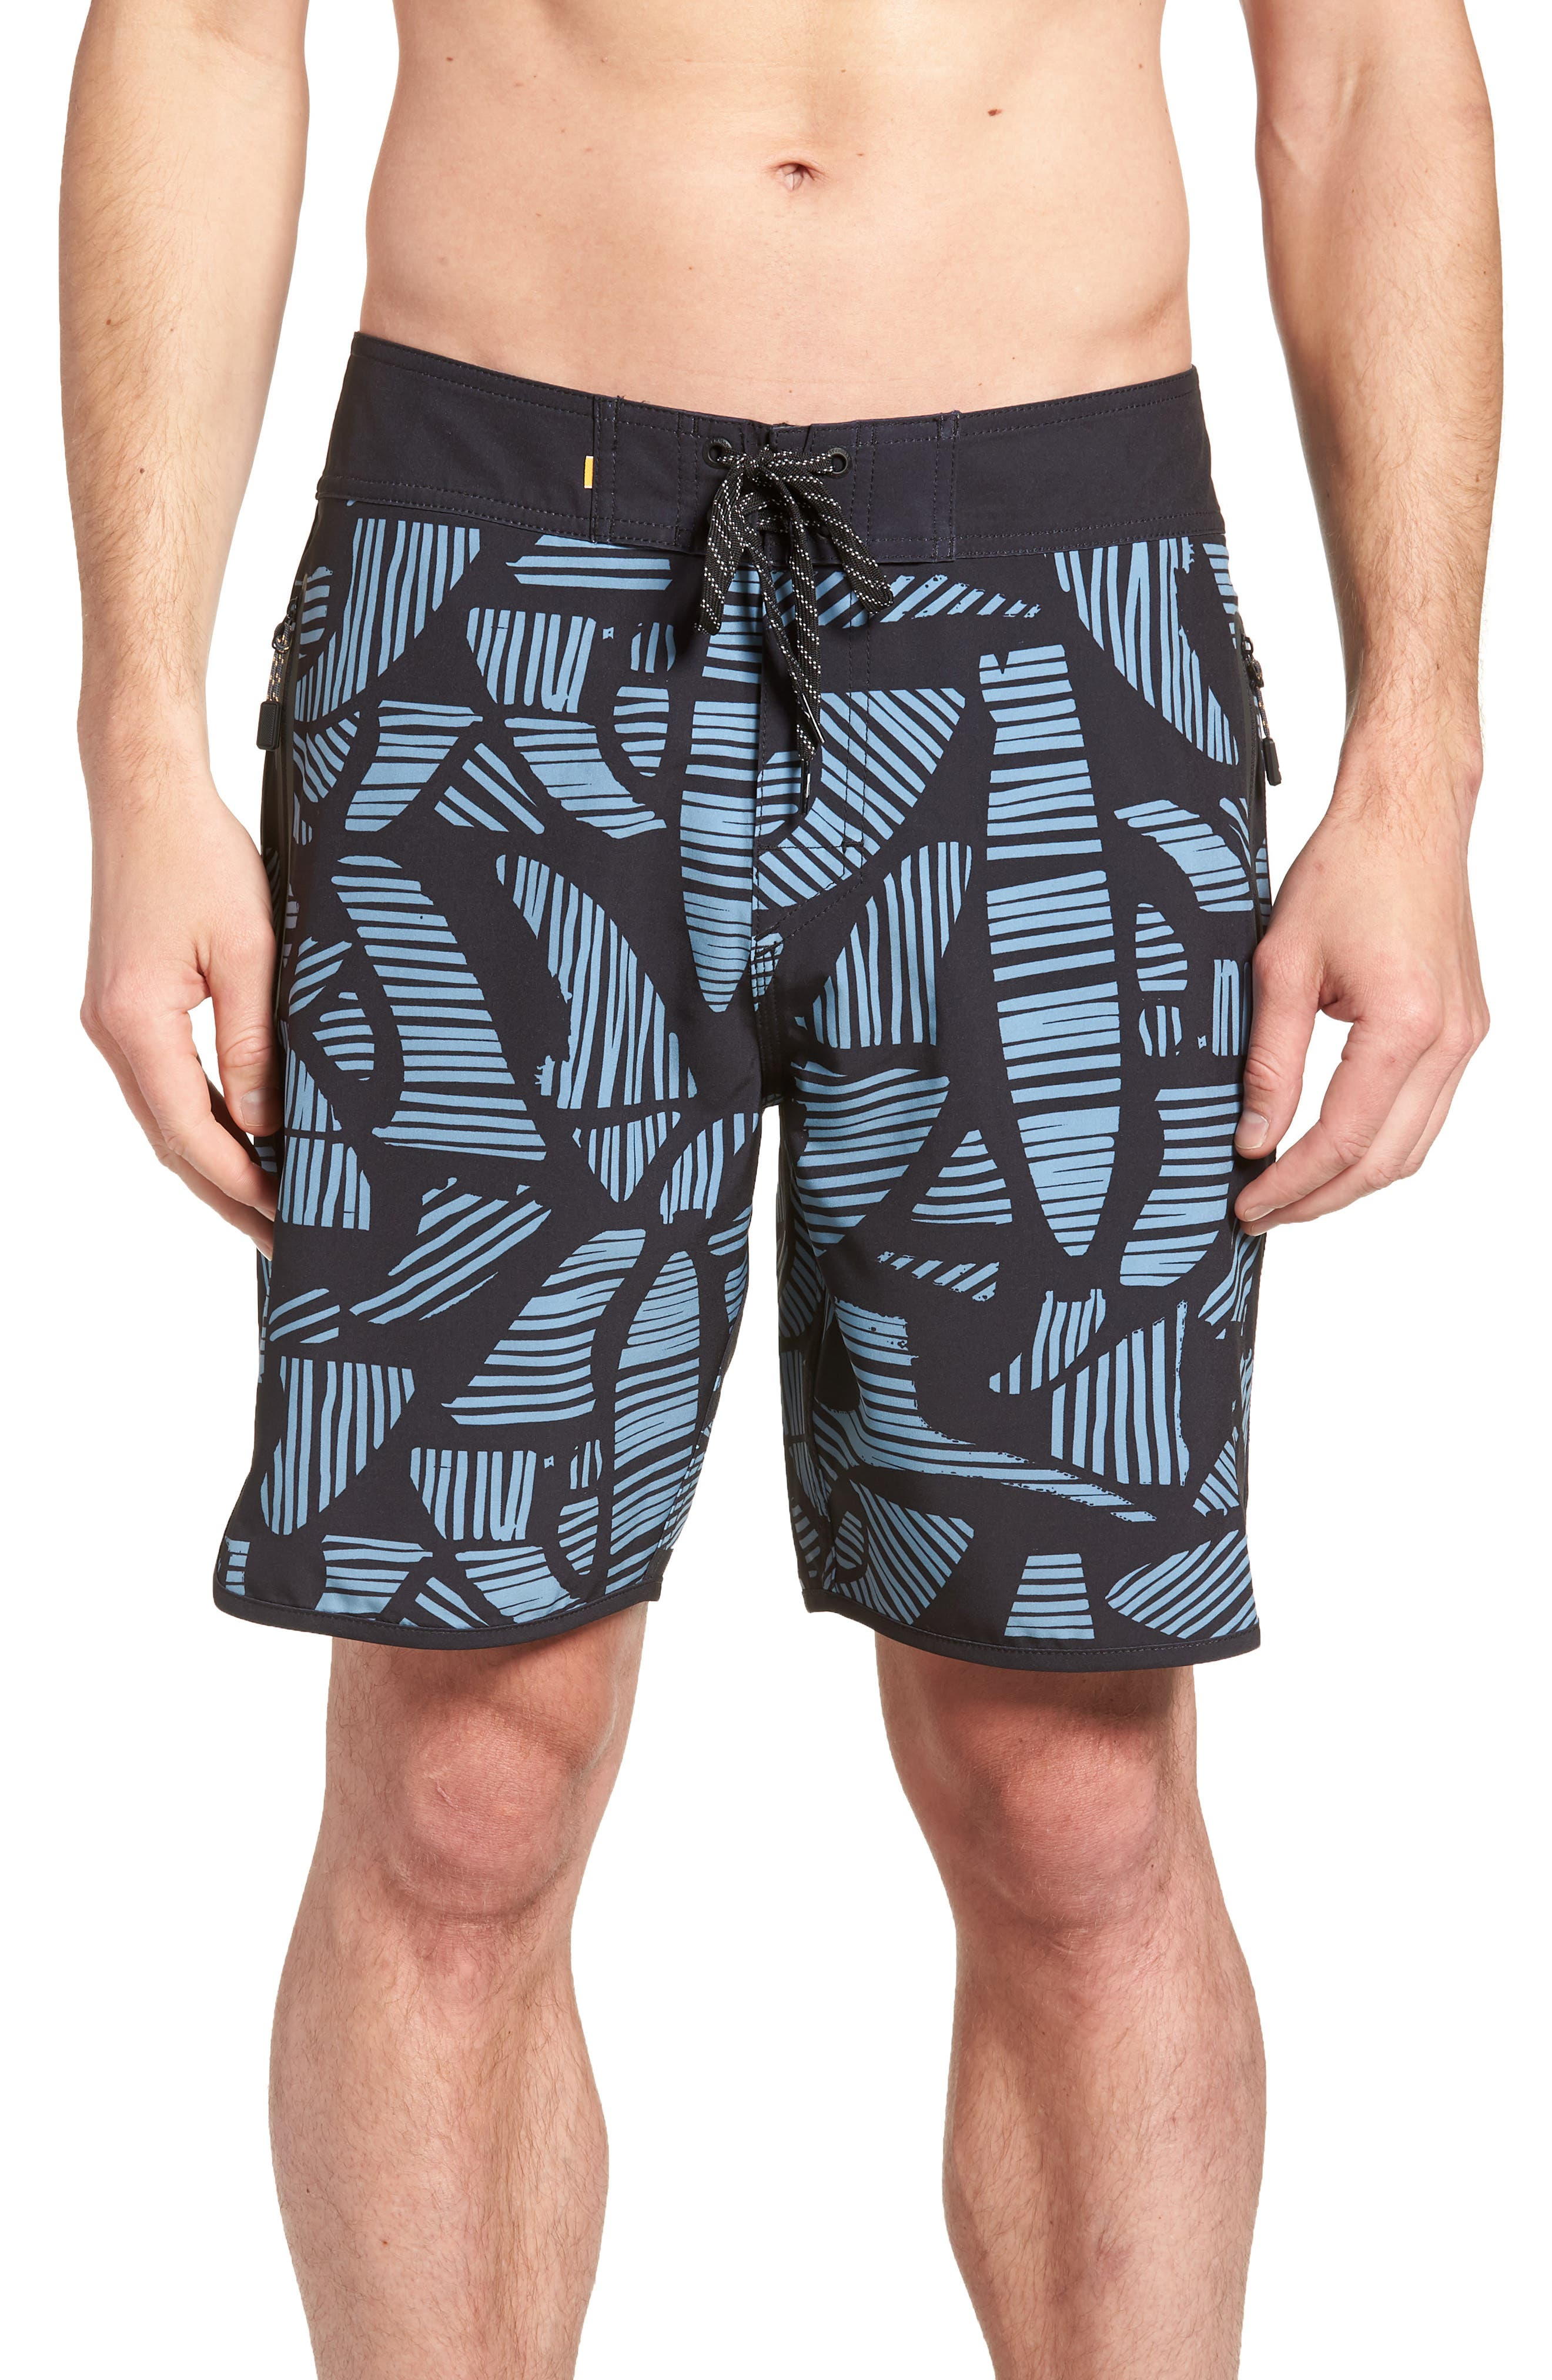 Odysea Board Shorts,                             Main thumbnail 1, color,                             002